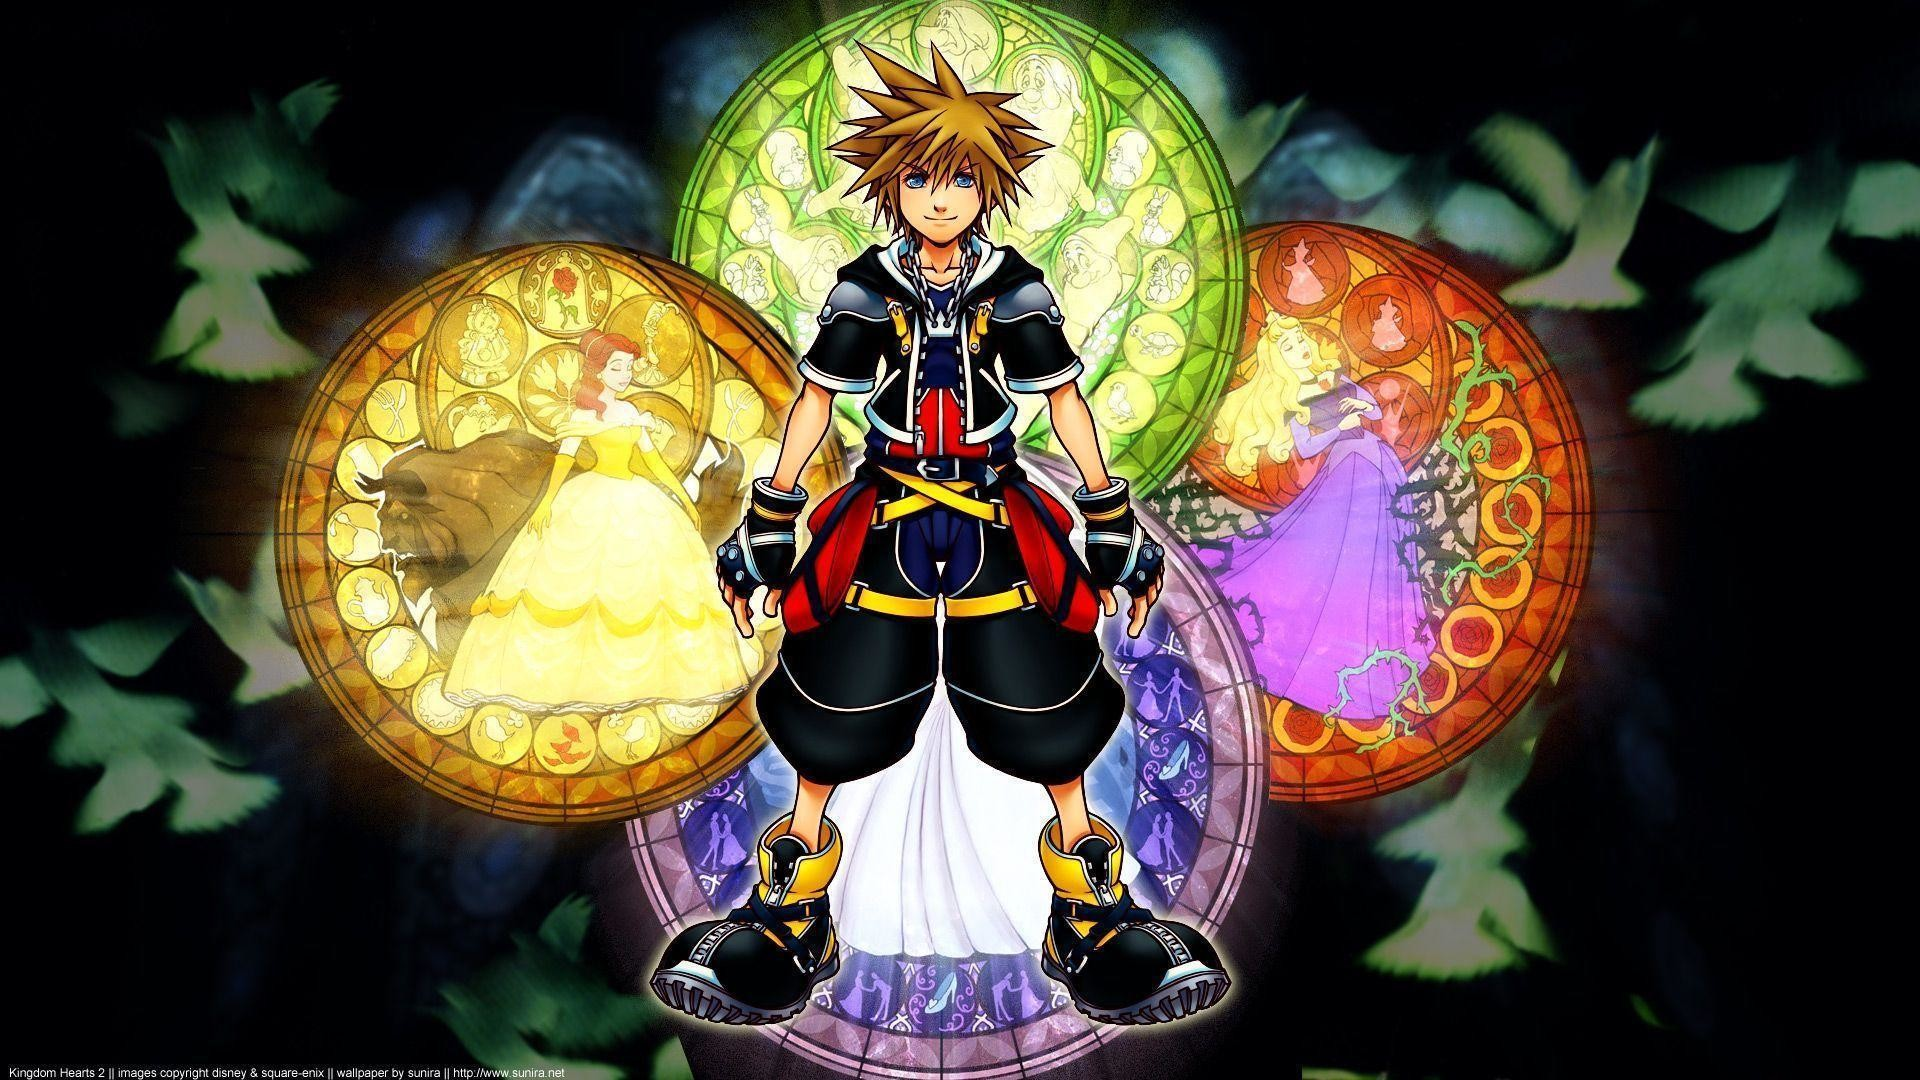 Kingdom Hearts Axel Wallpaper – WallDevil